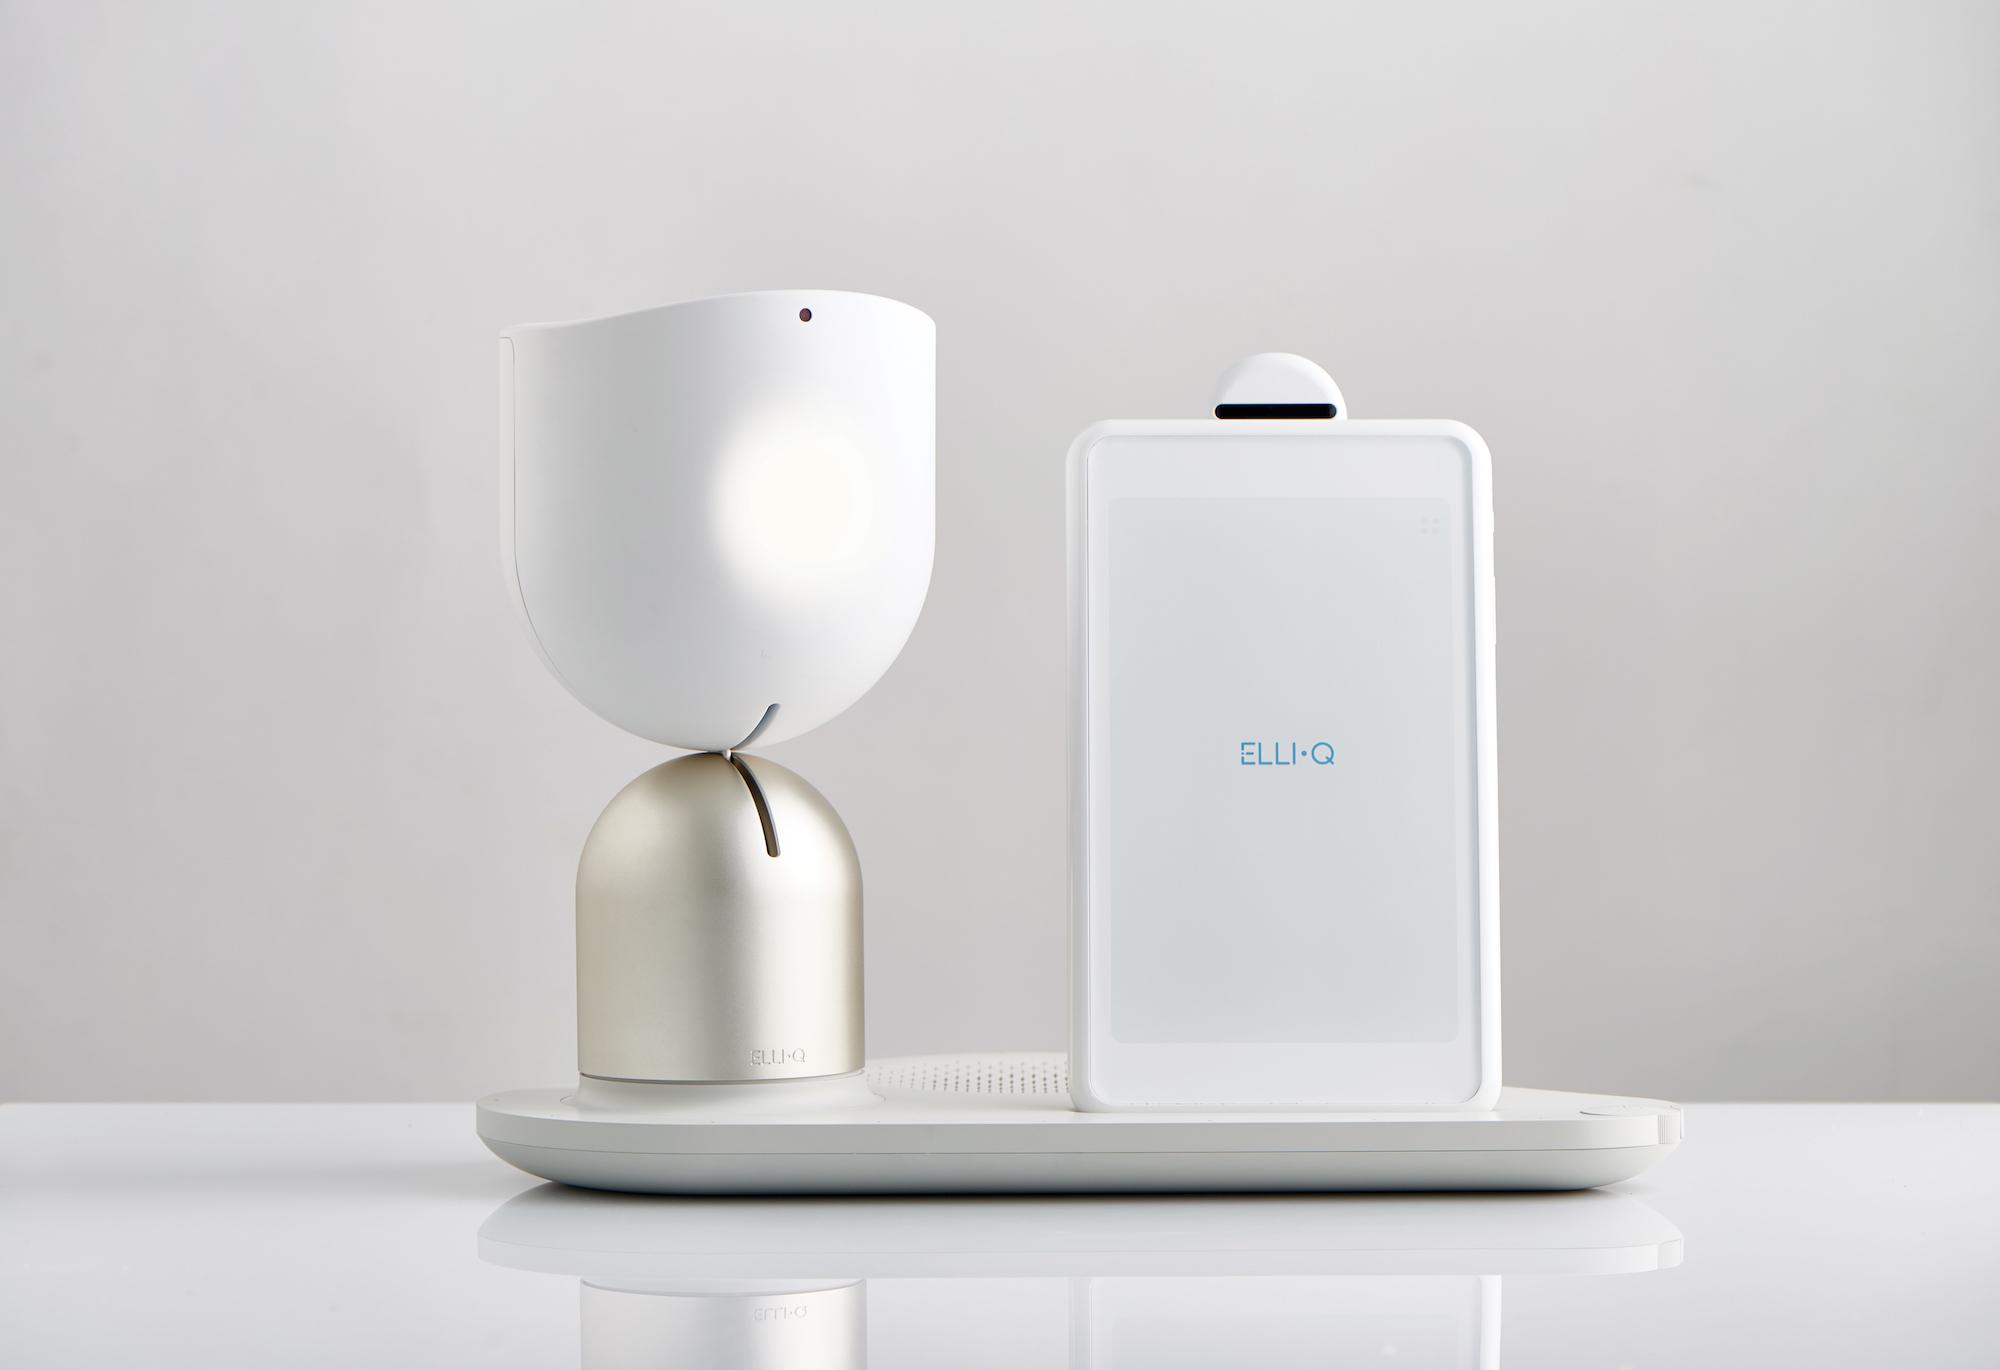 INTUITION ROBOTICS FIRST PRODUCT, THE ELLIQ